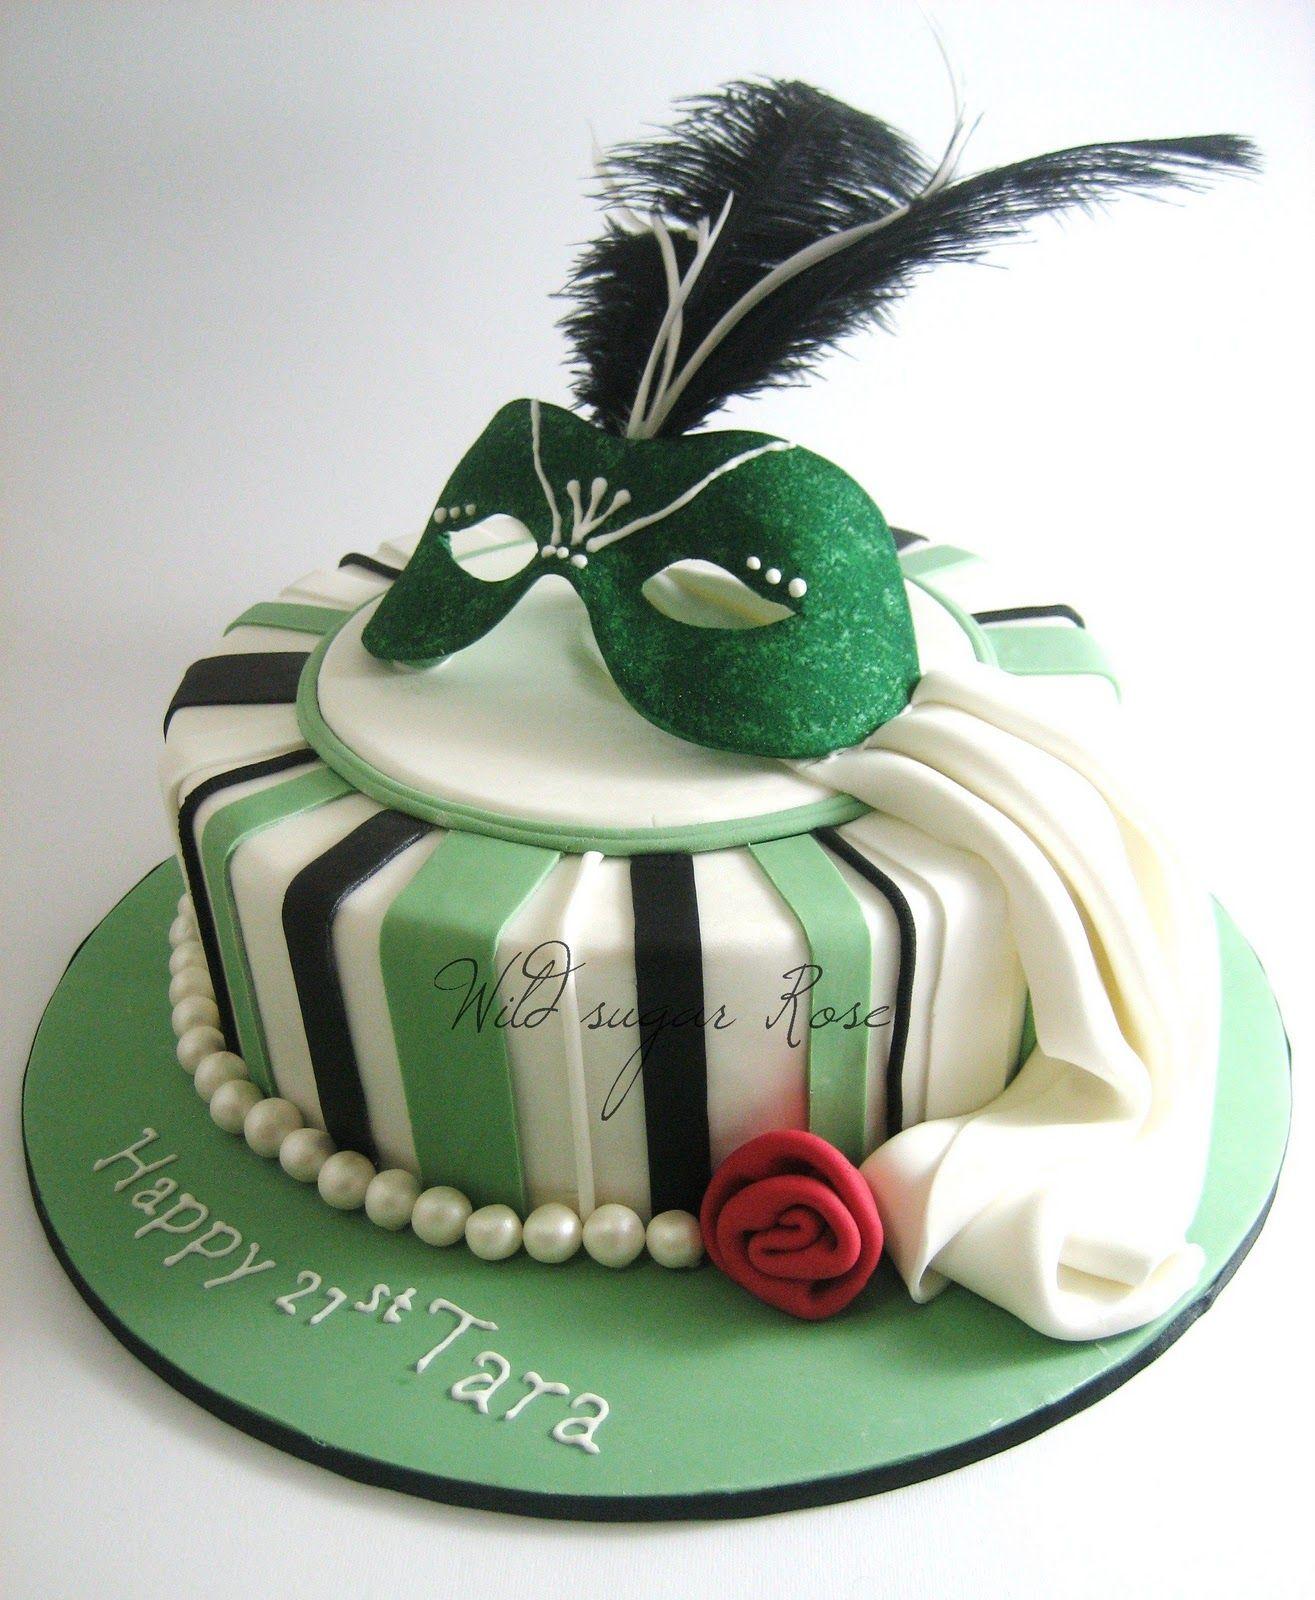 Wedding Cake Classes: Image Detail For -Wild Sugar Rose